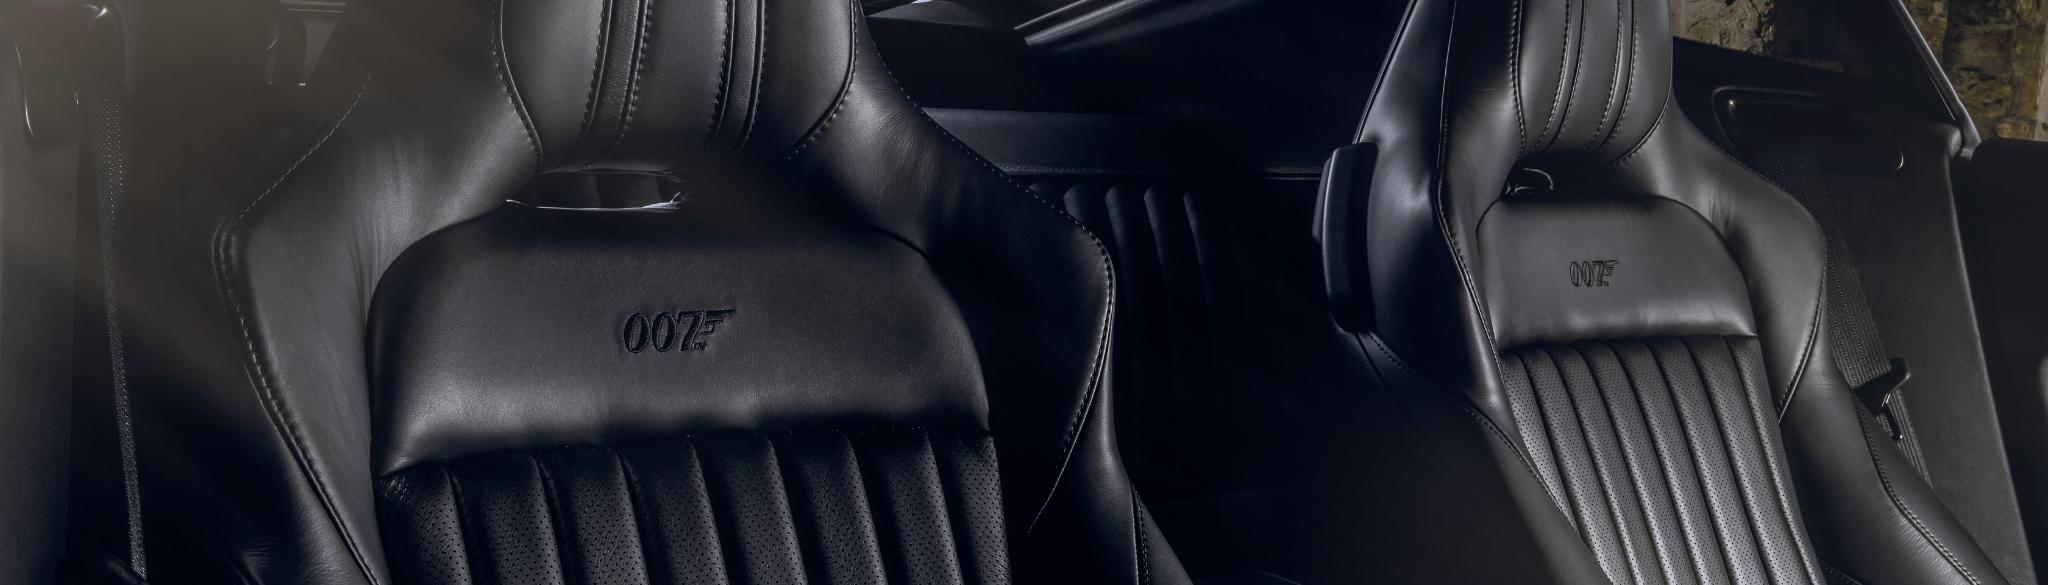 007 Aston Martin Vantage Bond Edition